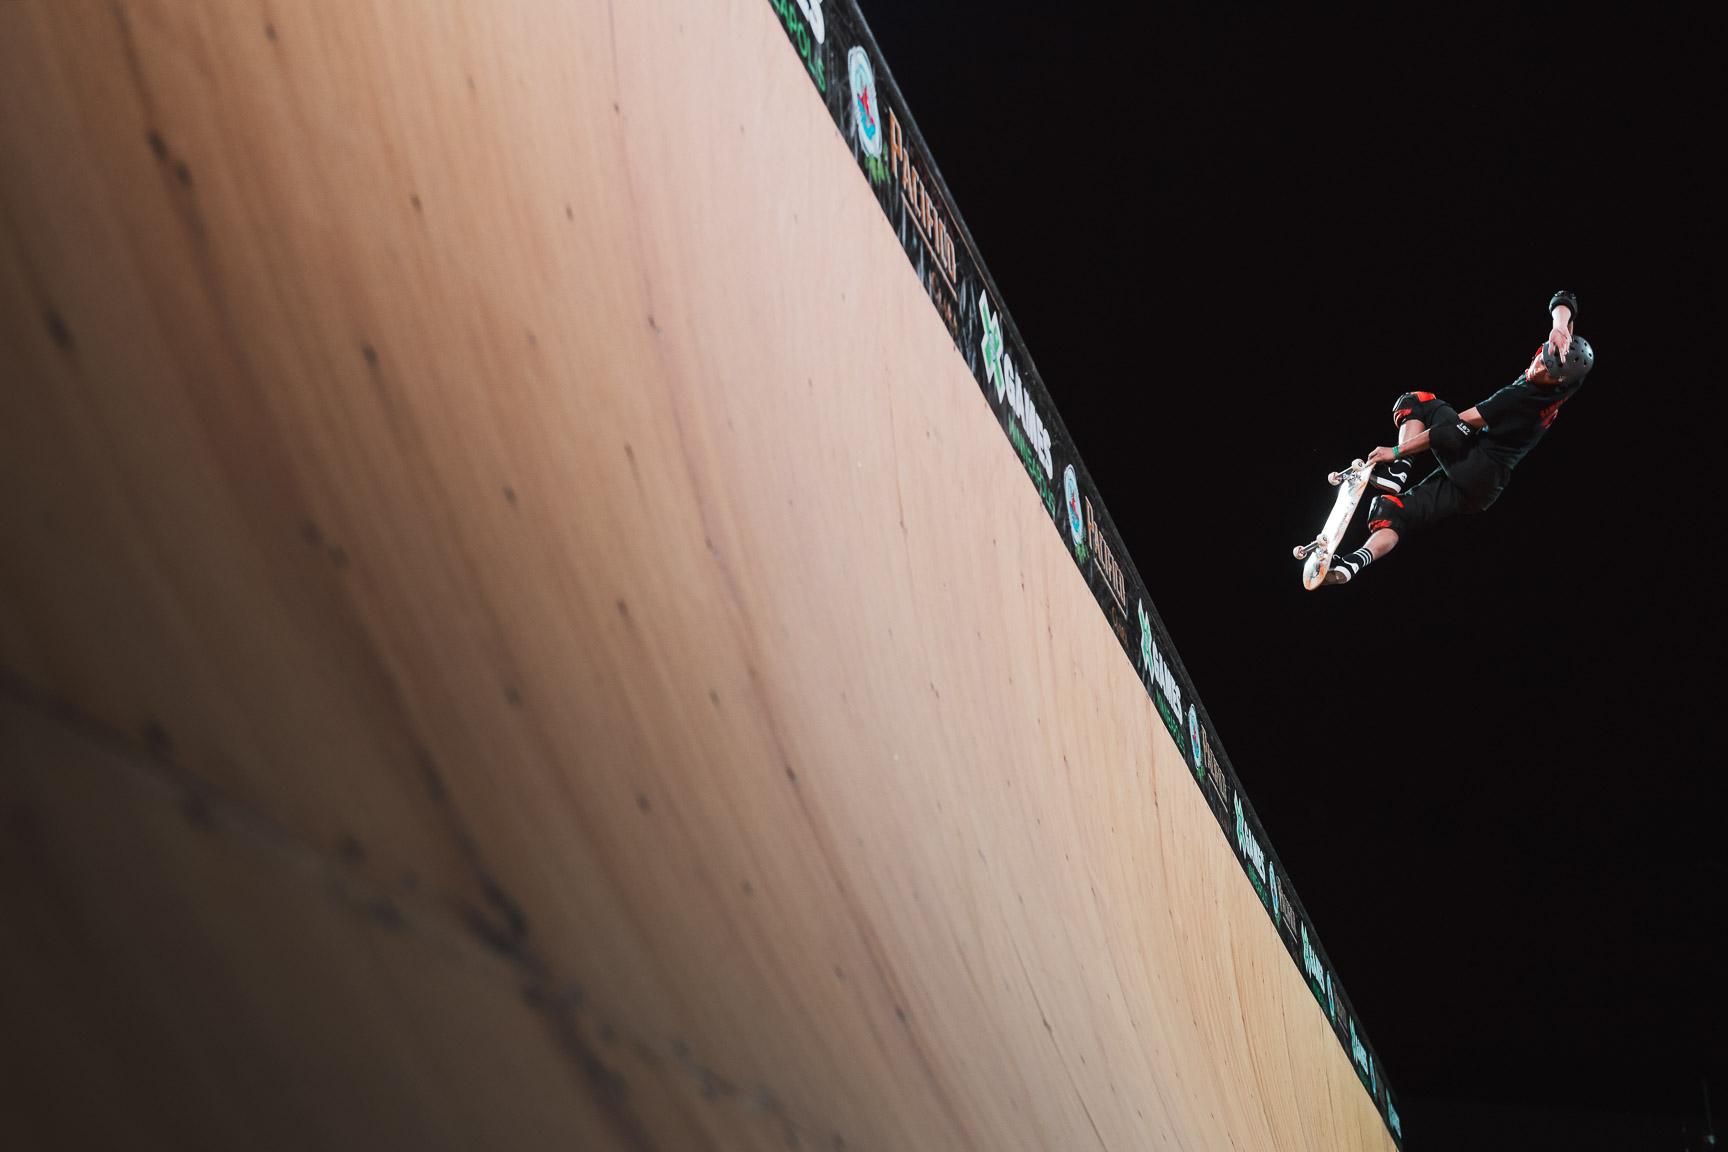 Moto Shibata, Skateboard Vert final